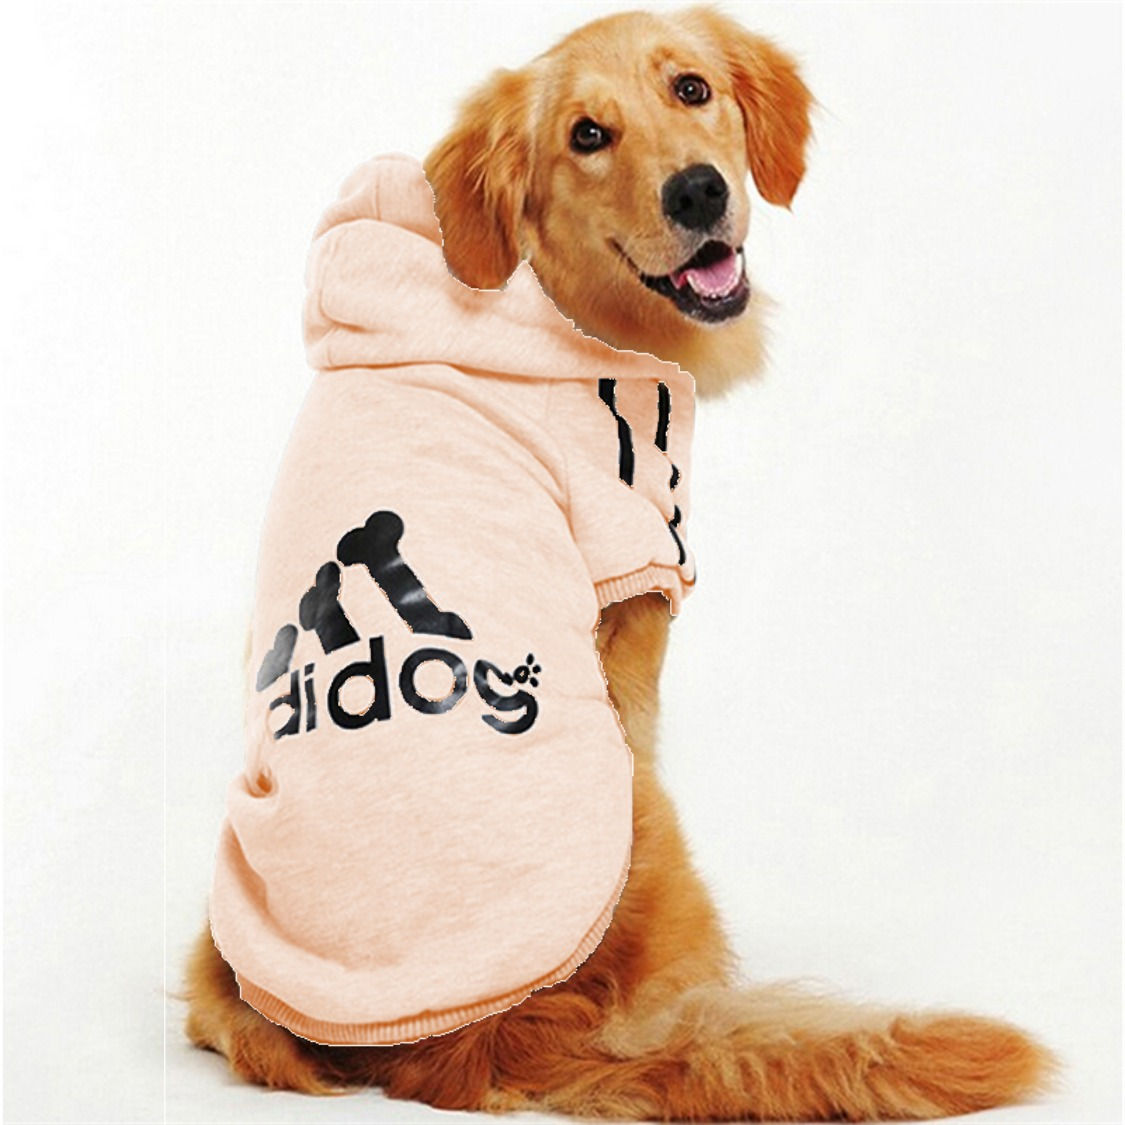 Chamarra ropa perro sudadera adidog rosa mascota 4xg en mercado libre - Comprar ropa en portugal ...